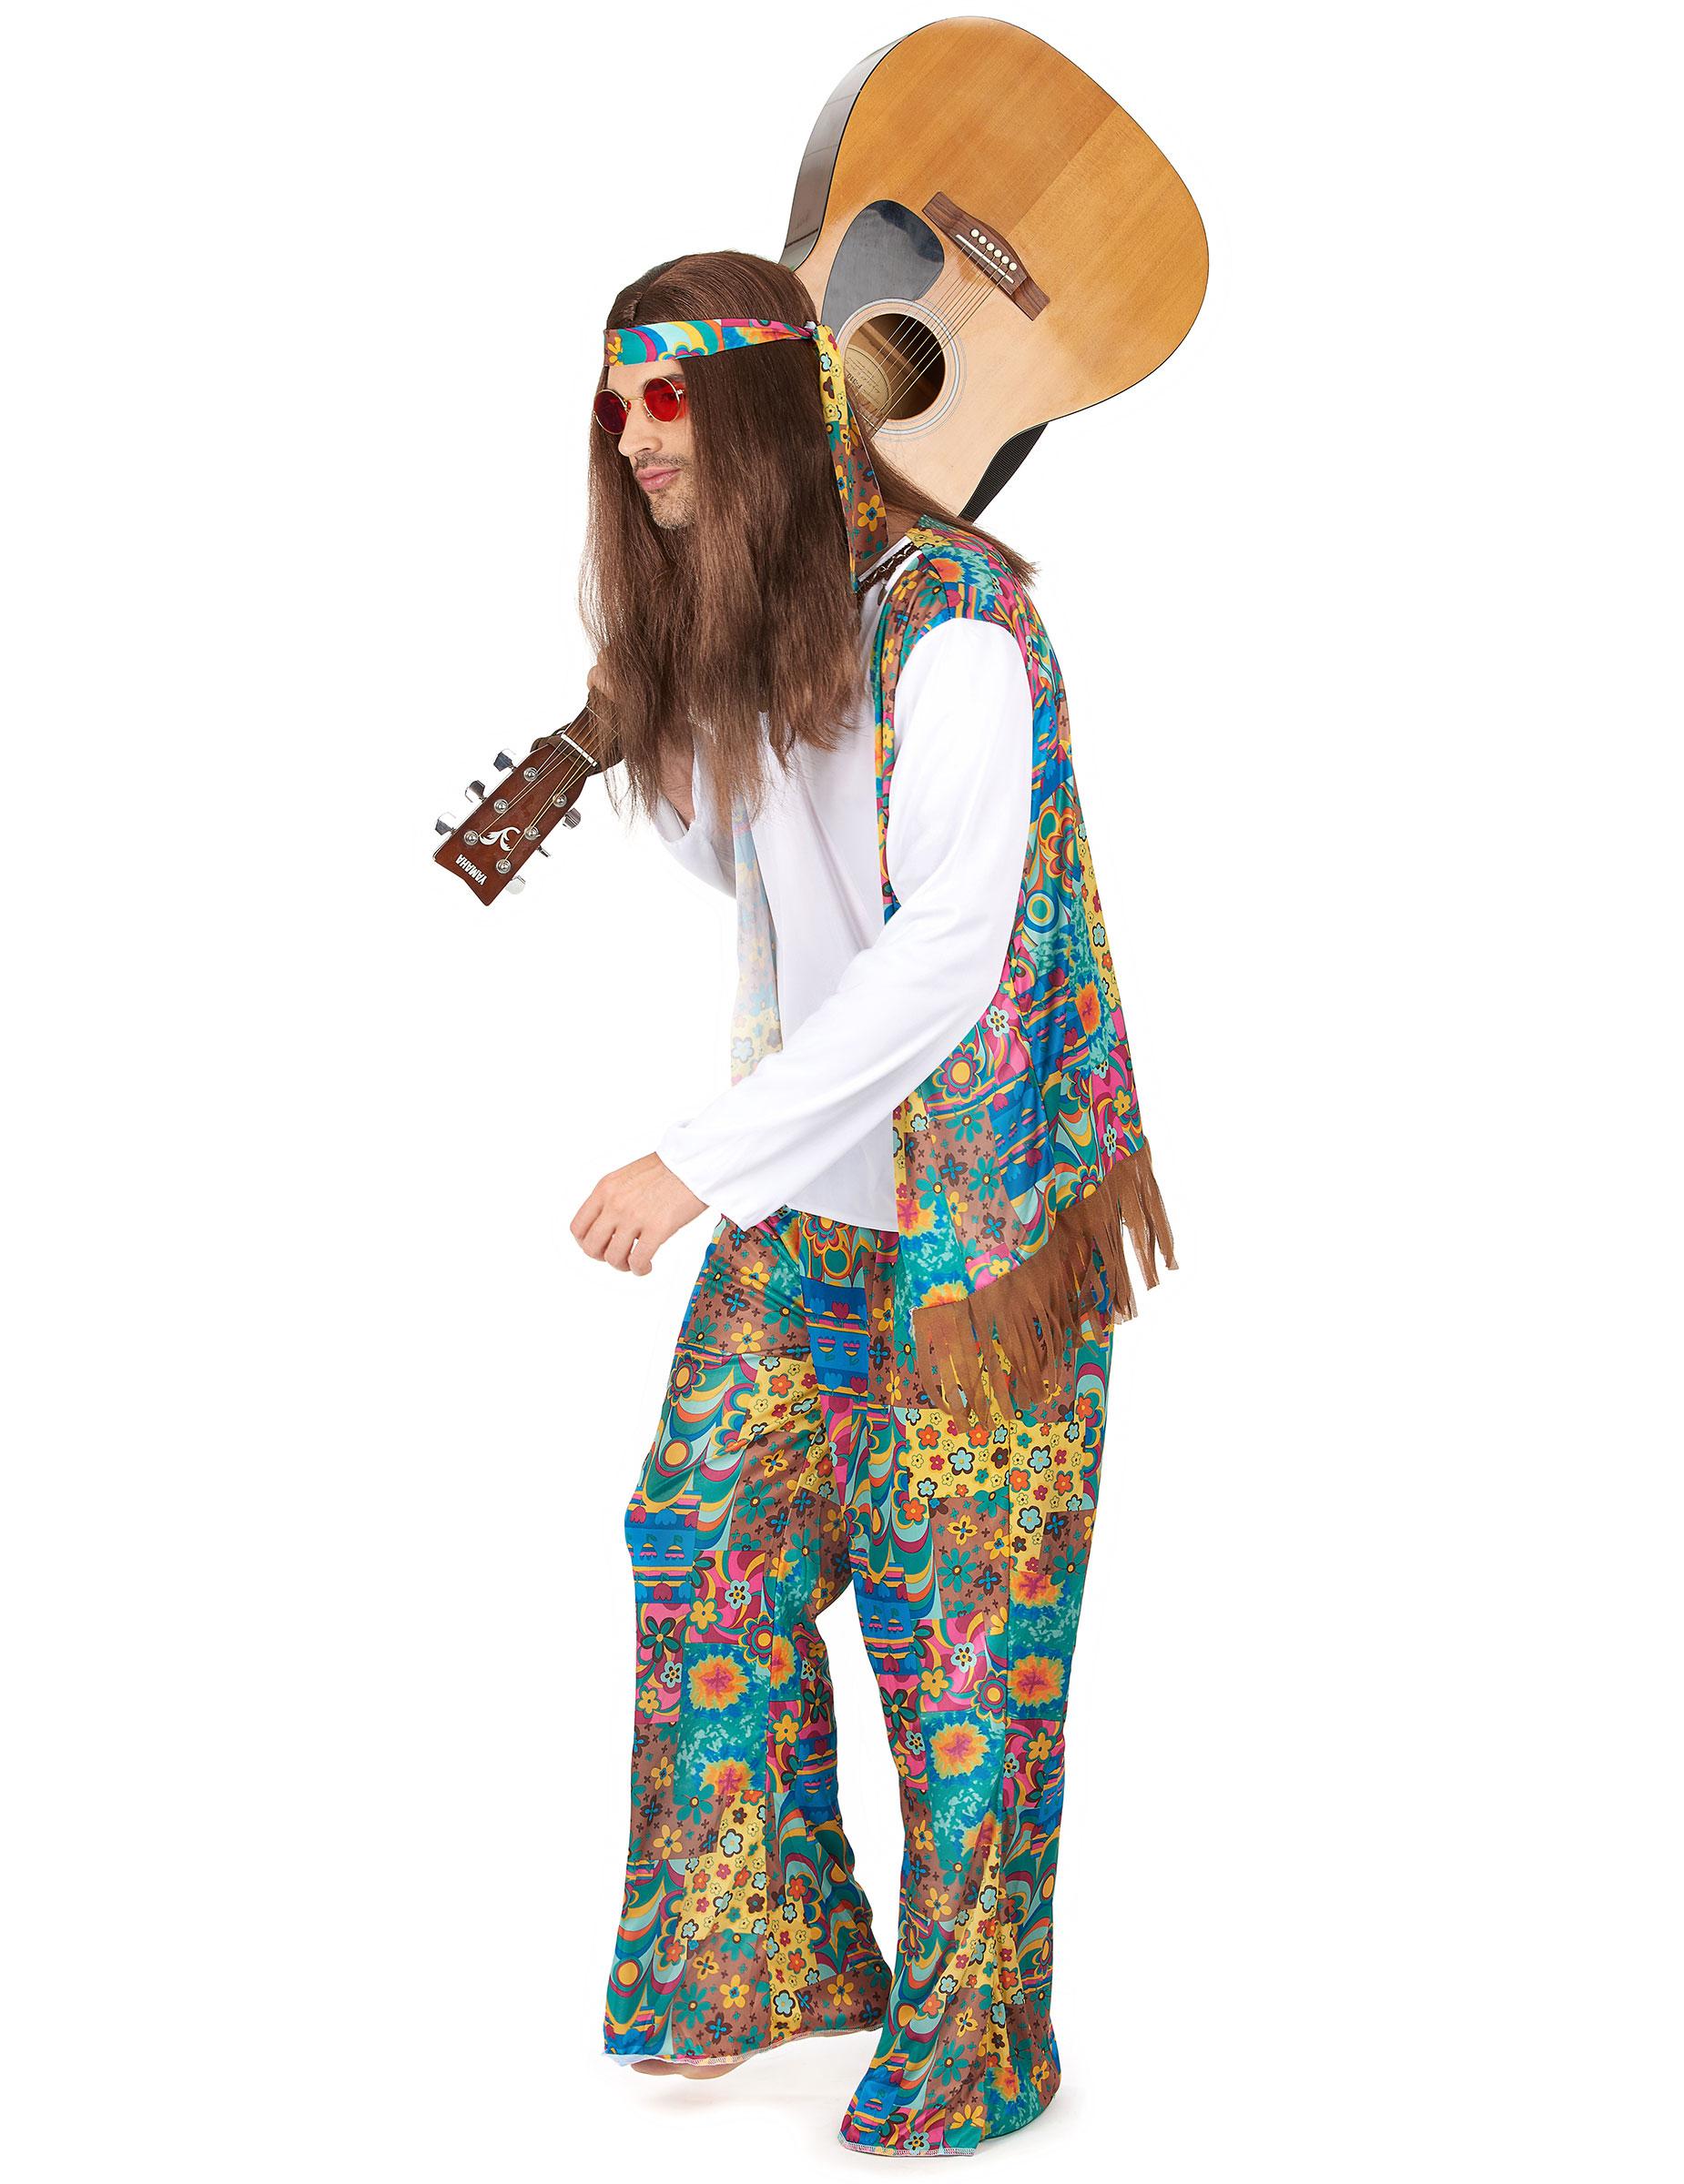 D guisements de hippies baba cool - Vetements hippie baba cool ...